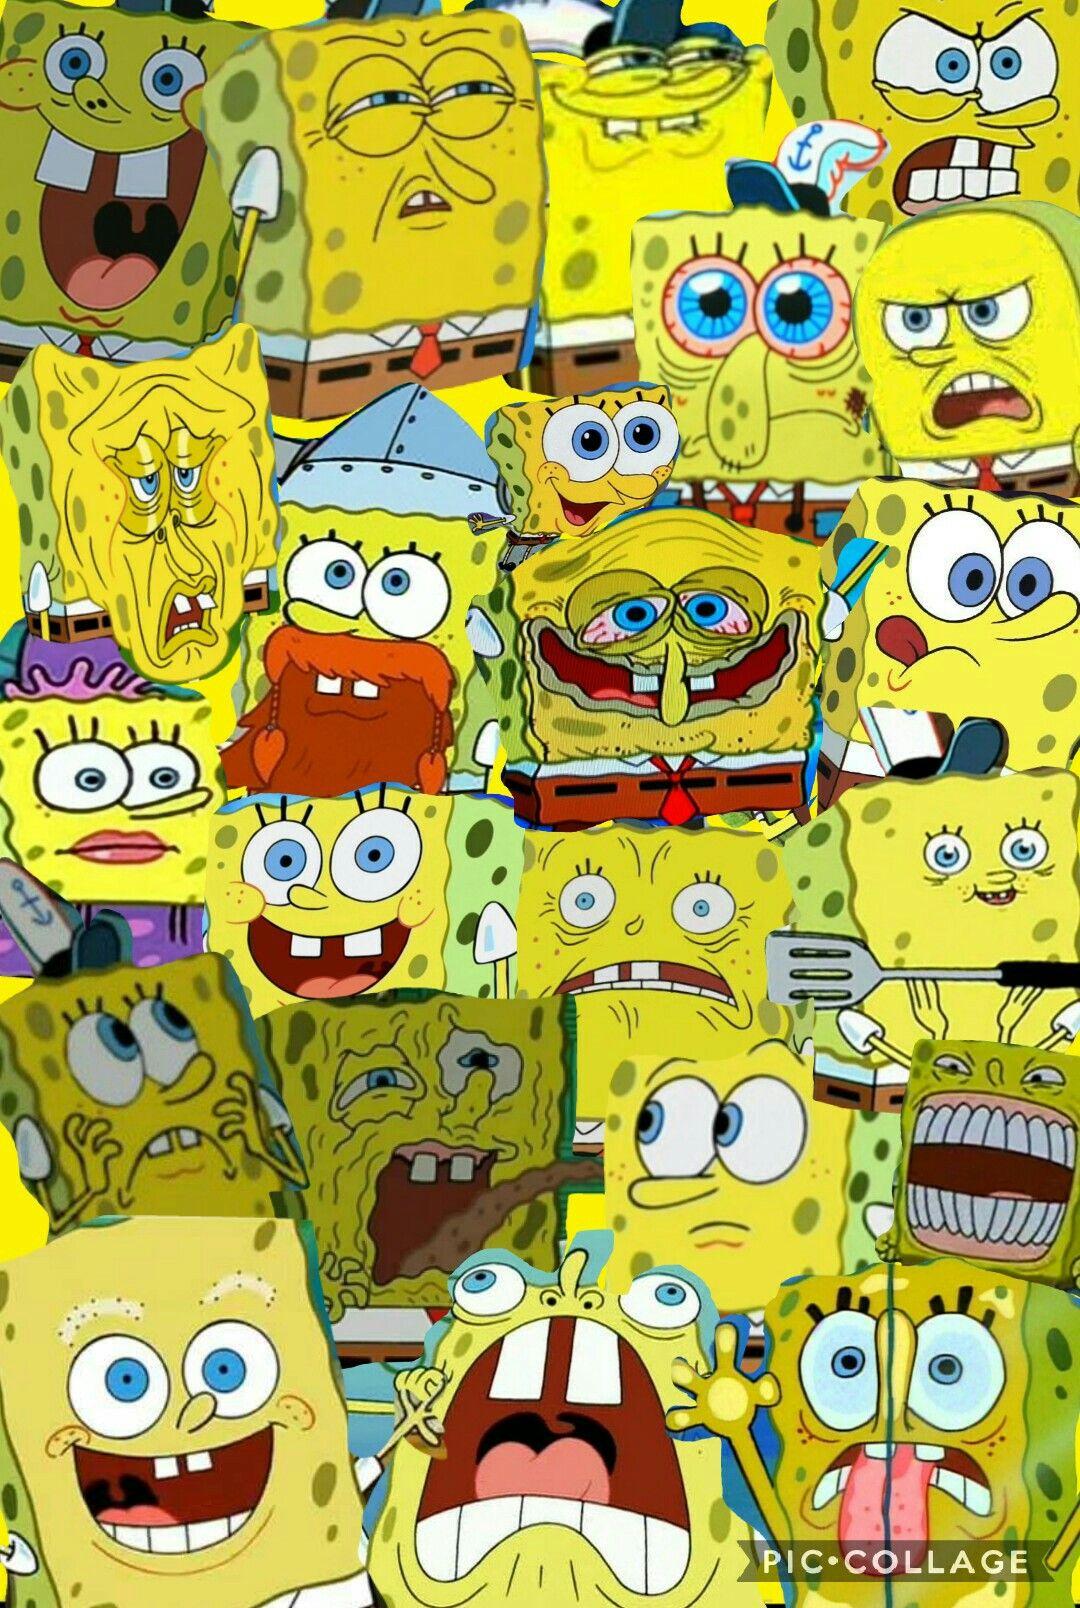 Collage Of Spongebob By Chrissy Kartun